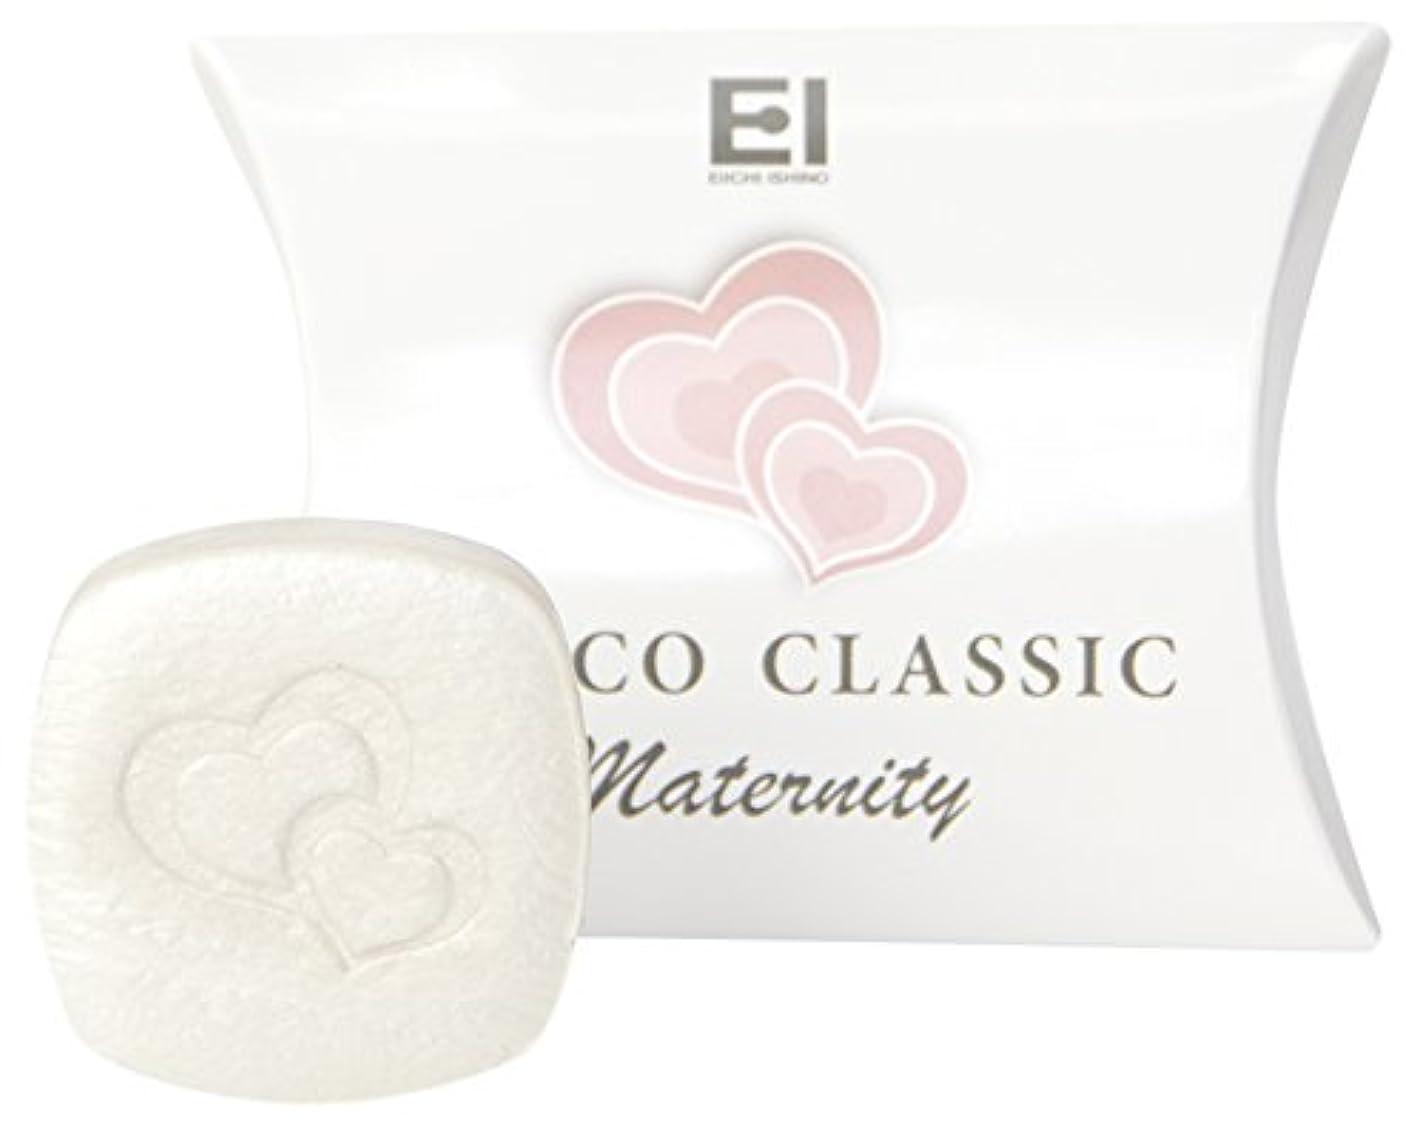 配置夫線形EI JUNCO CLASSIC MATERNITY SOAP 20g